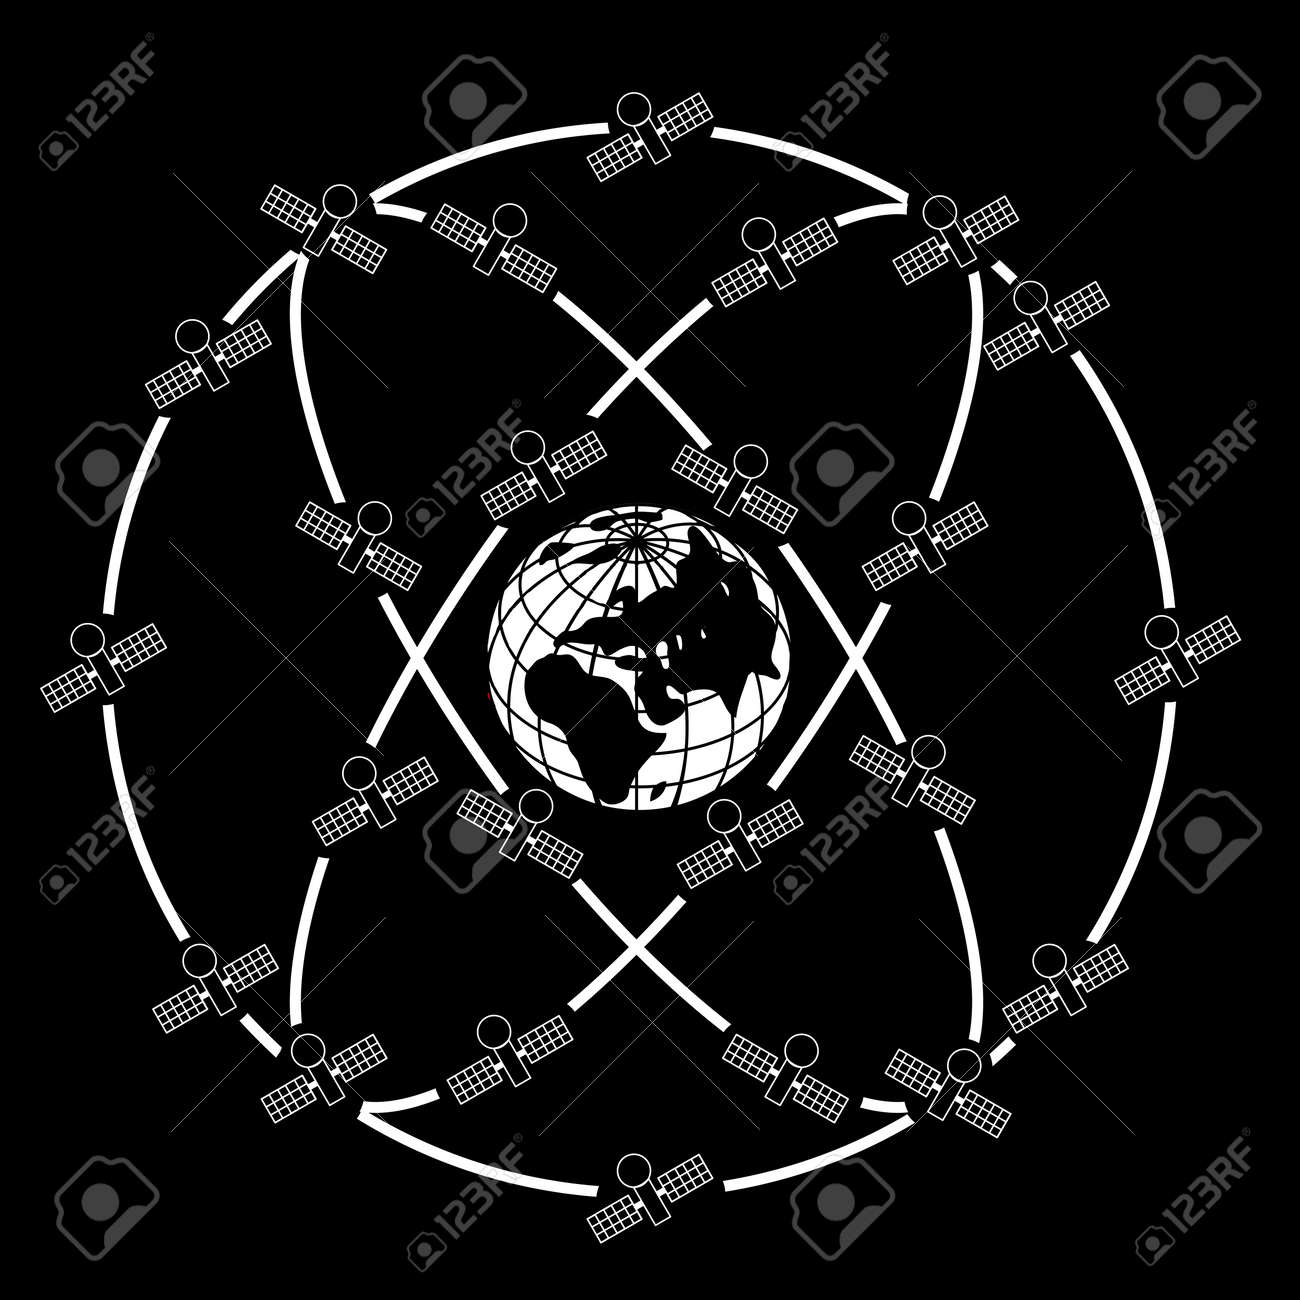 Space satellites in eccentric orbits around the Earth. Stock Vector - 11171889